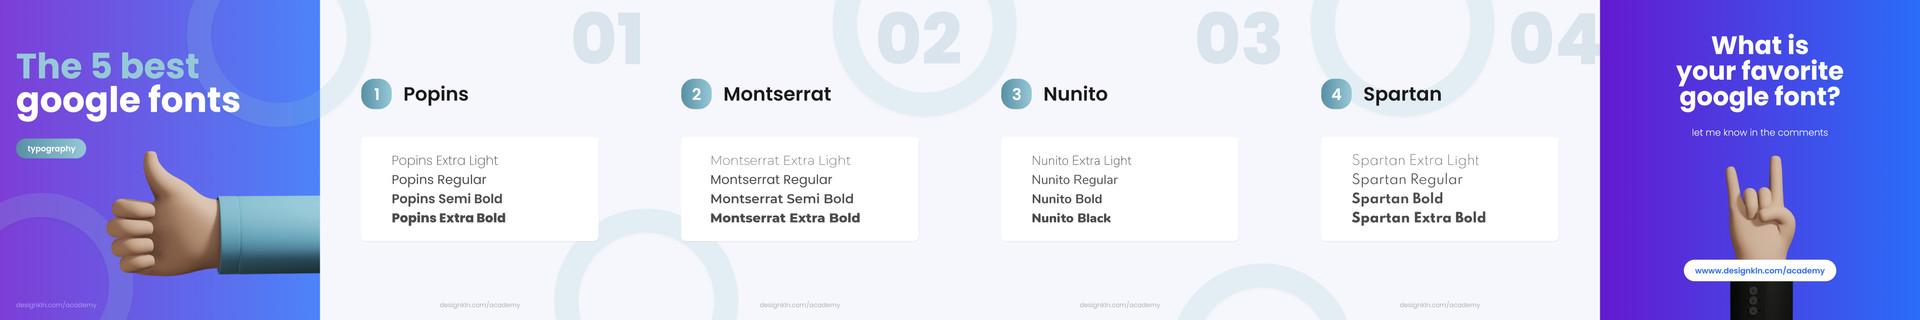 Top 5 google fonts.jpg